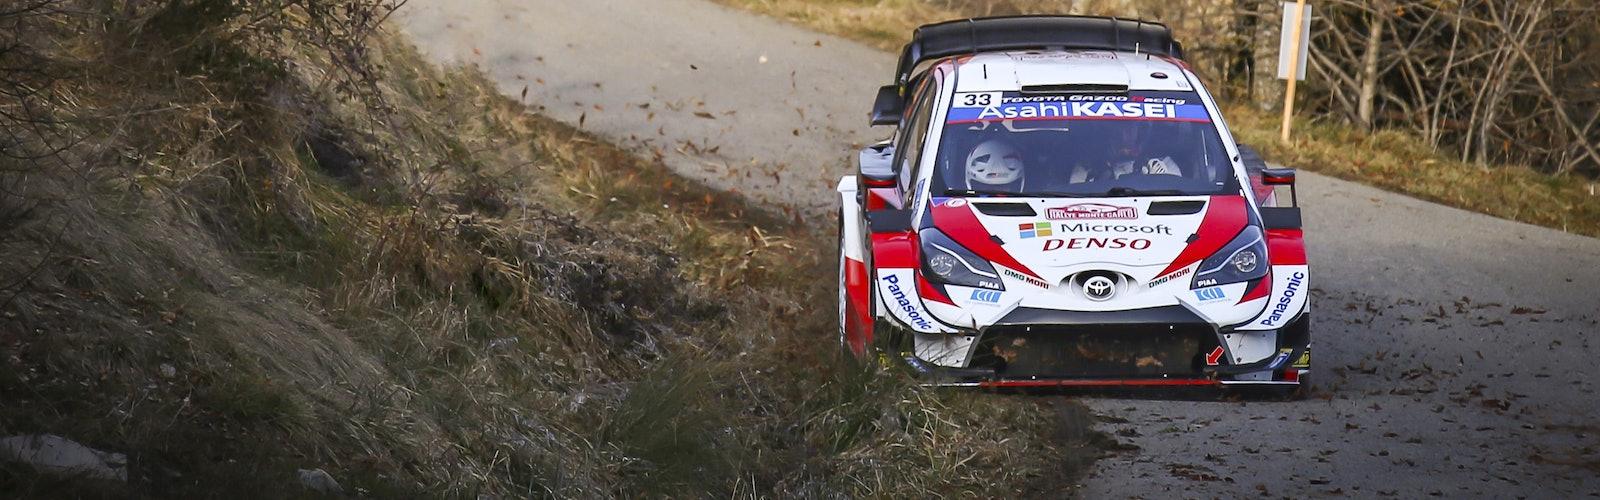 WRC_2020_Rd.1_104